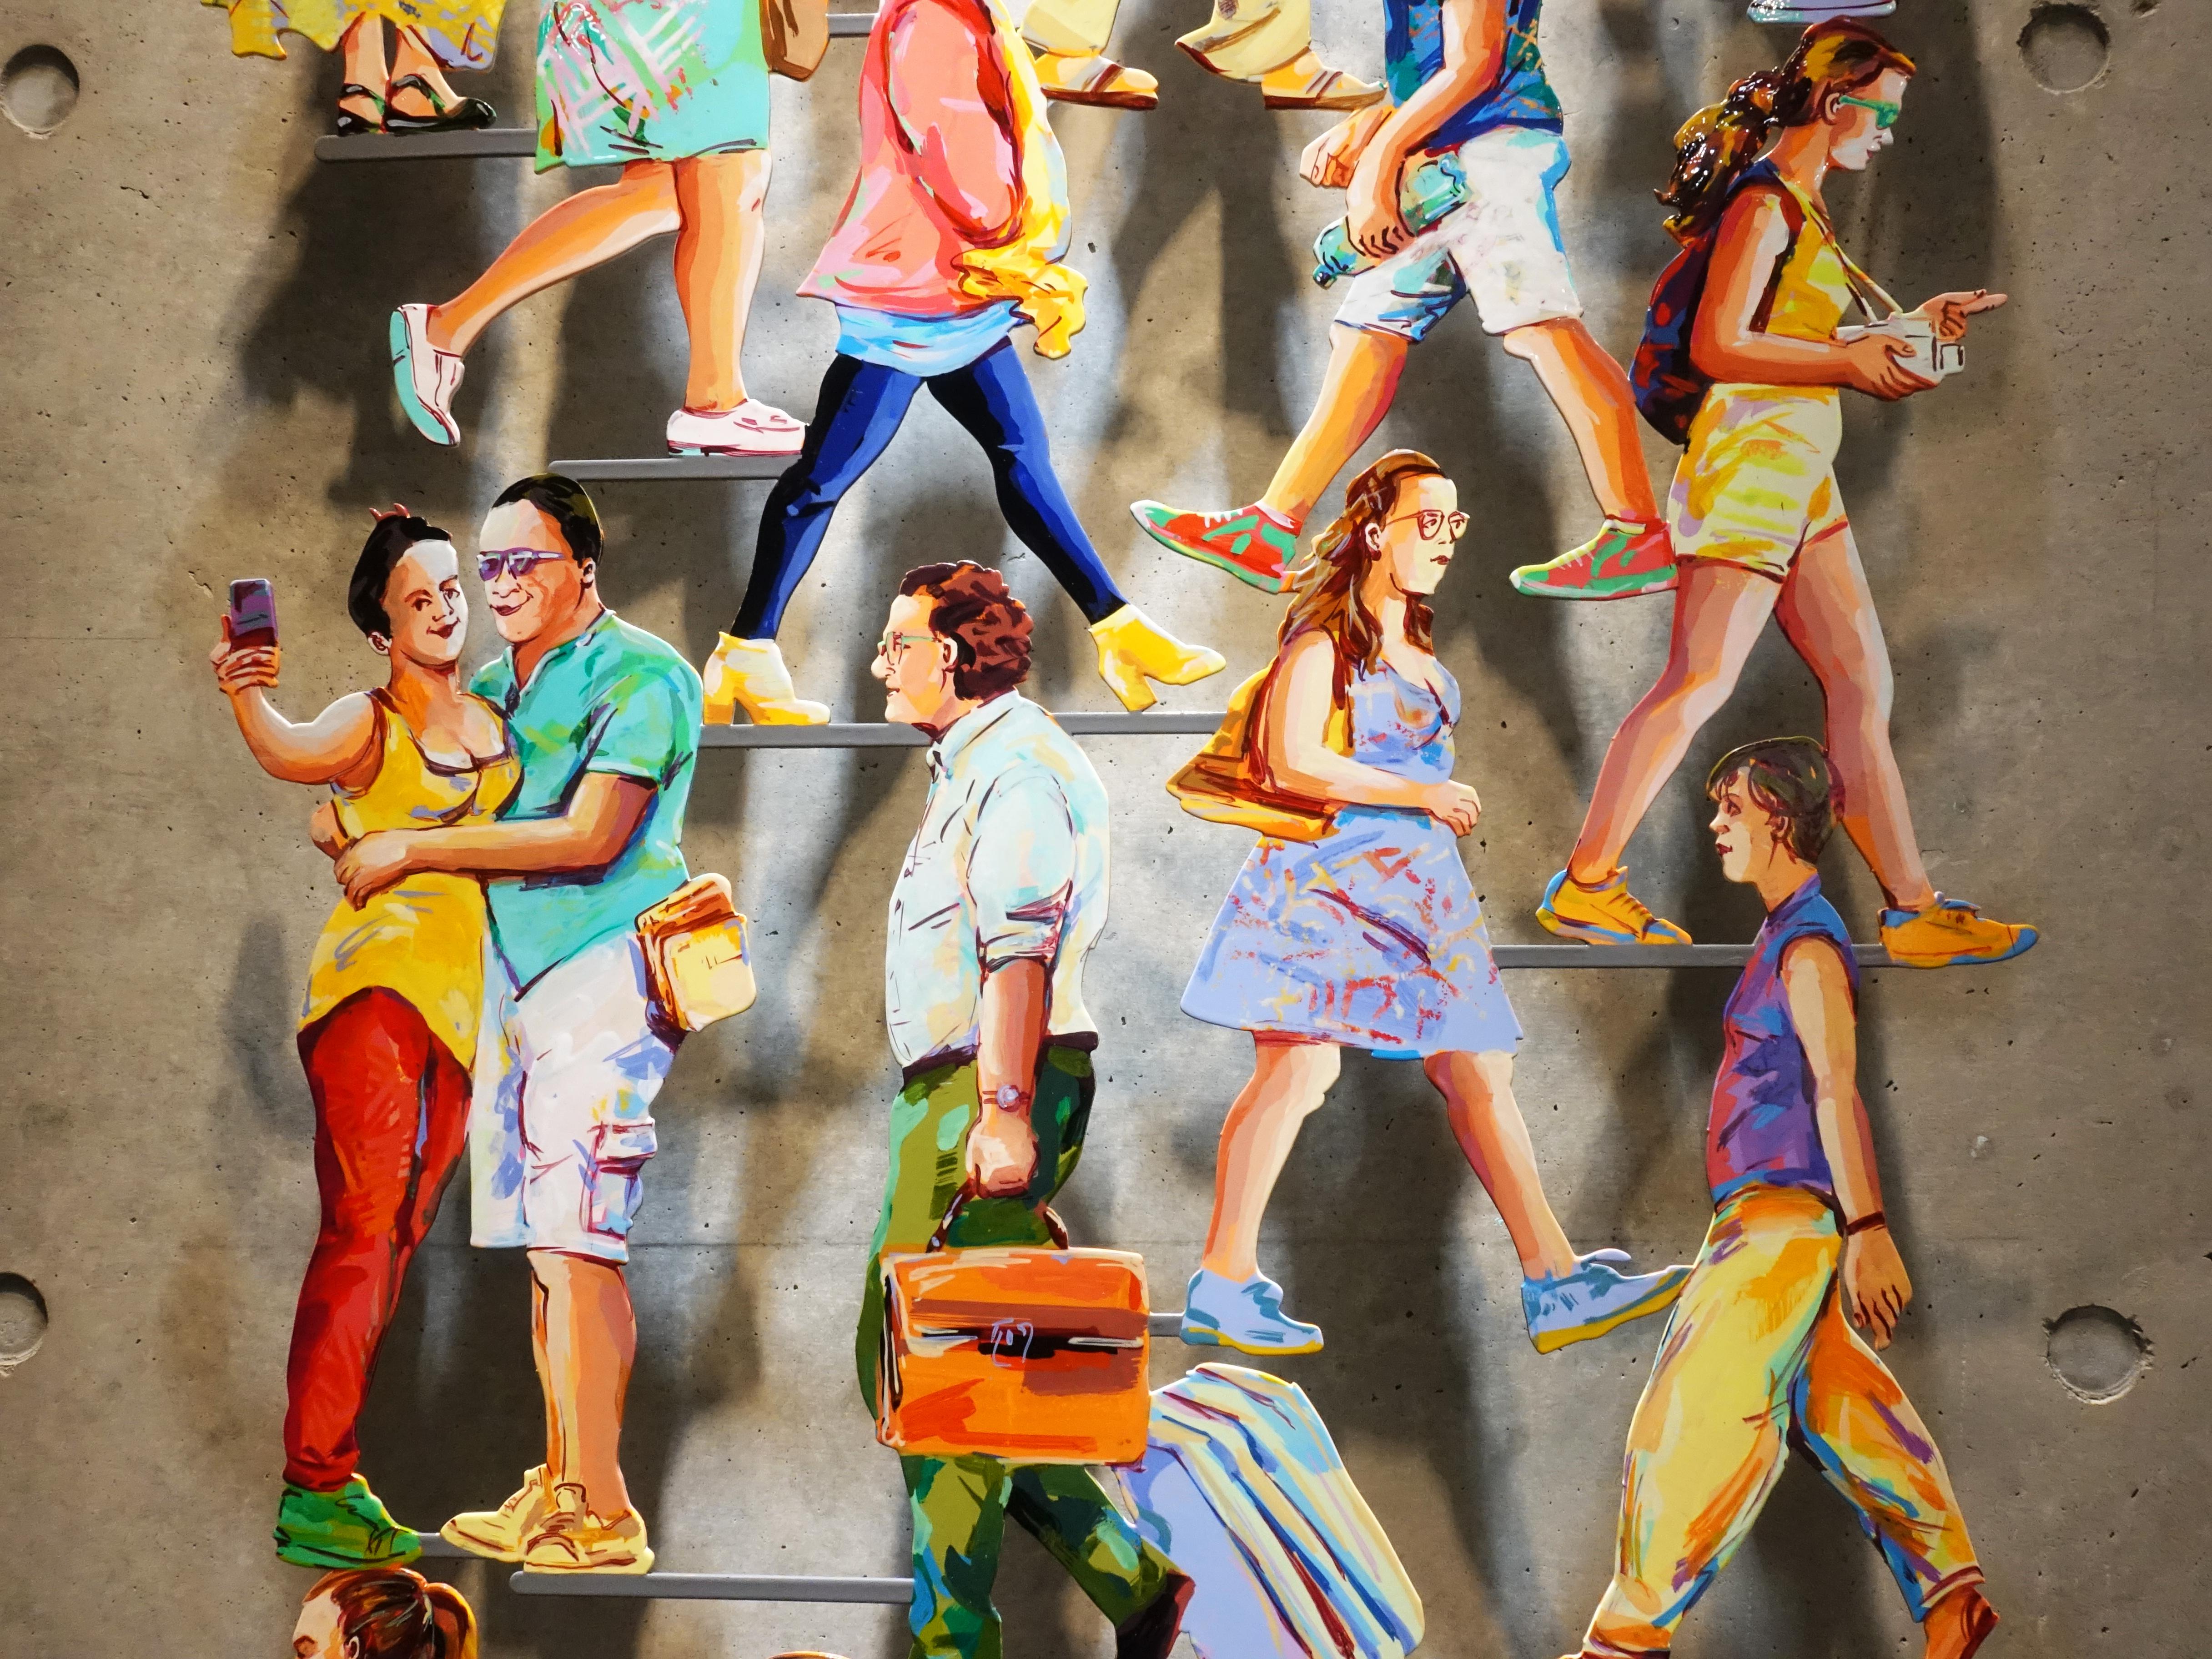 David Gerstein,《Street View》細節,64 x 180 x 5 cm,Aluminum鋁1層,2018。